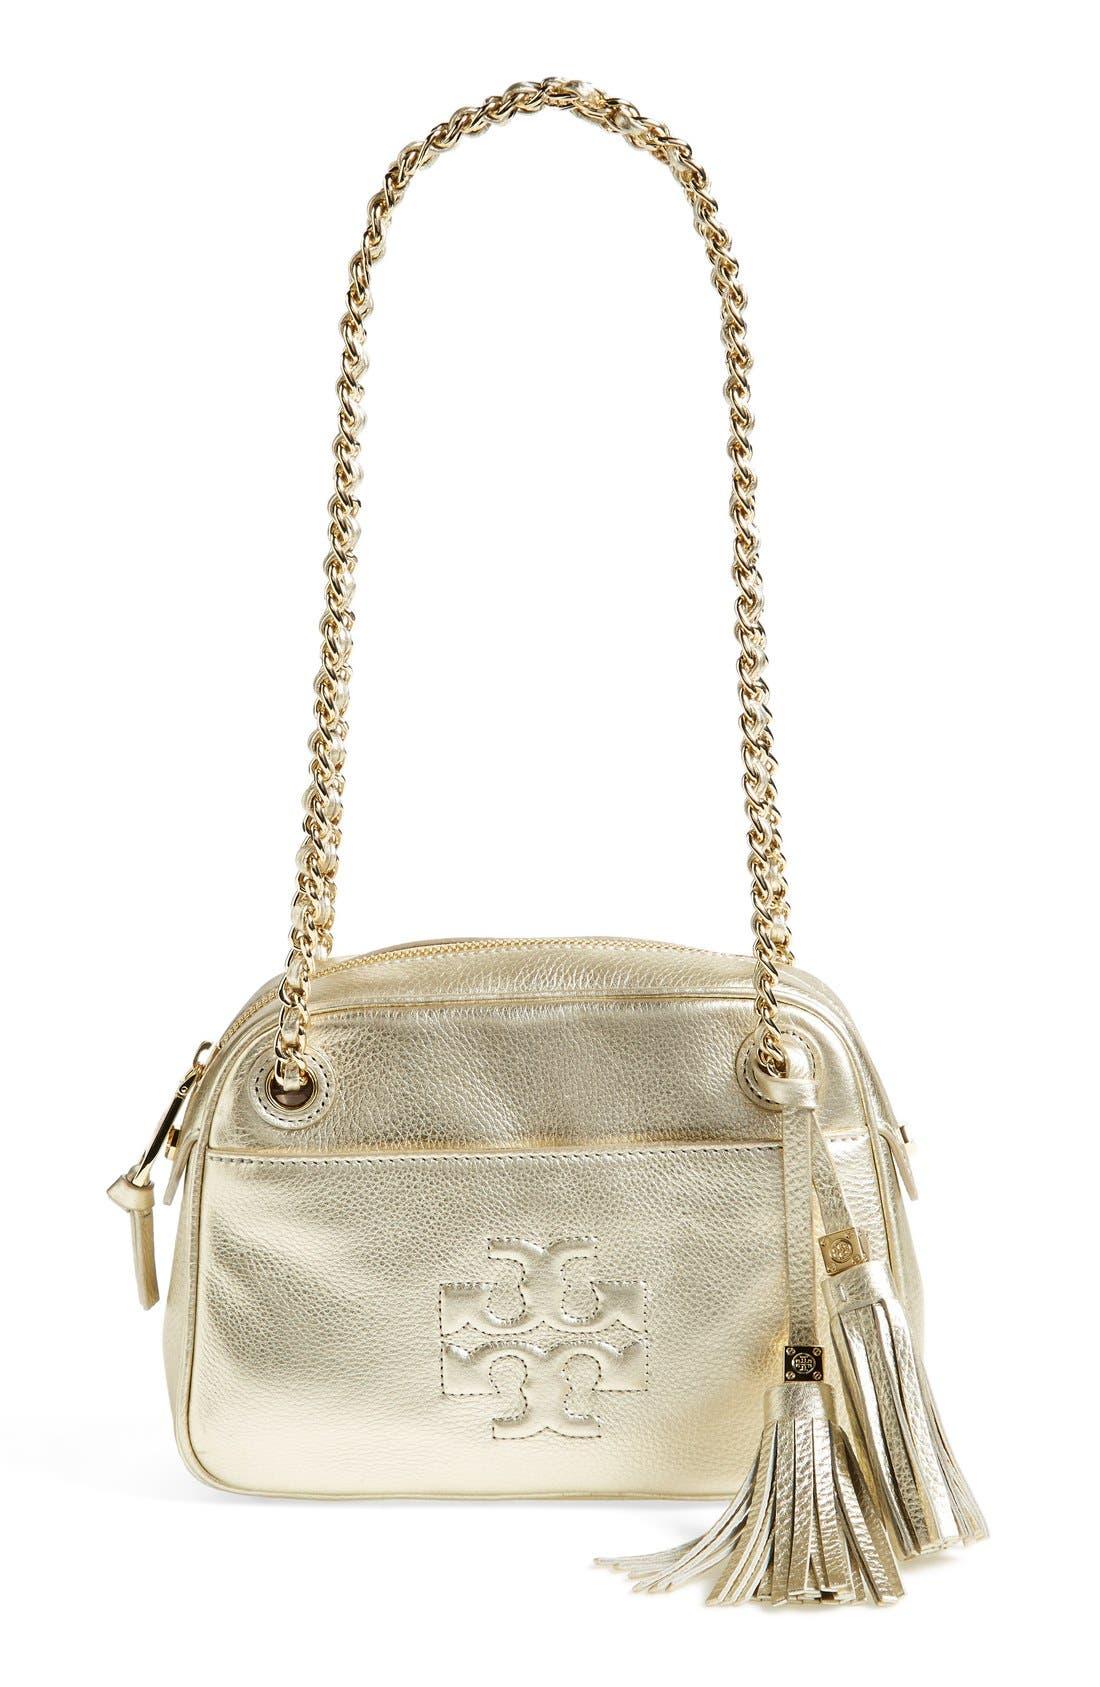 Main Image - Tory Burch 'Thea' Metallic Leather Crossbody Bag